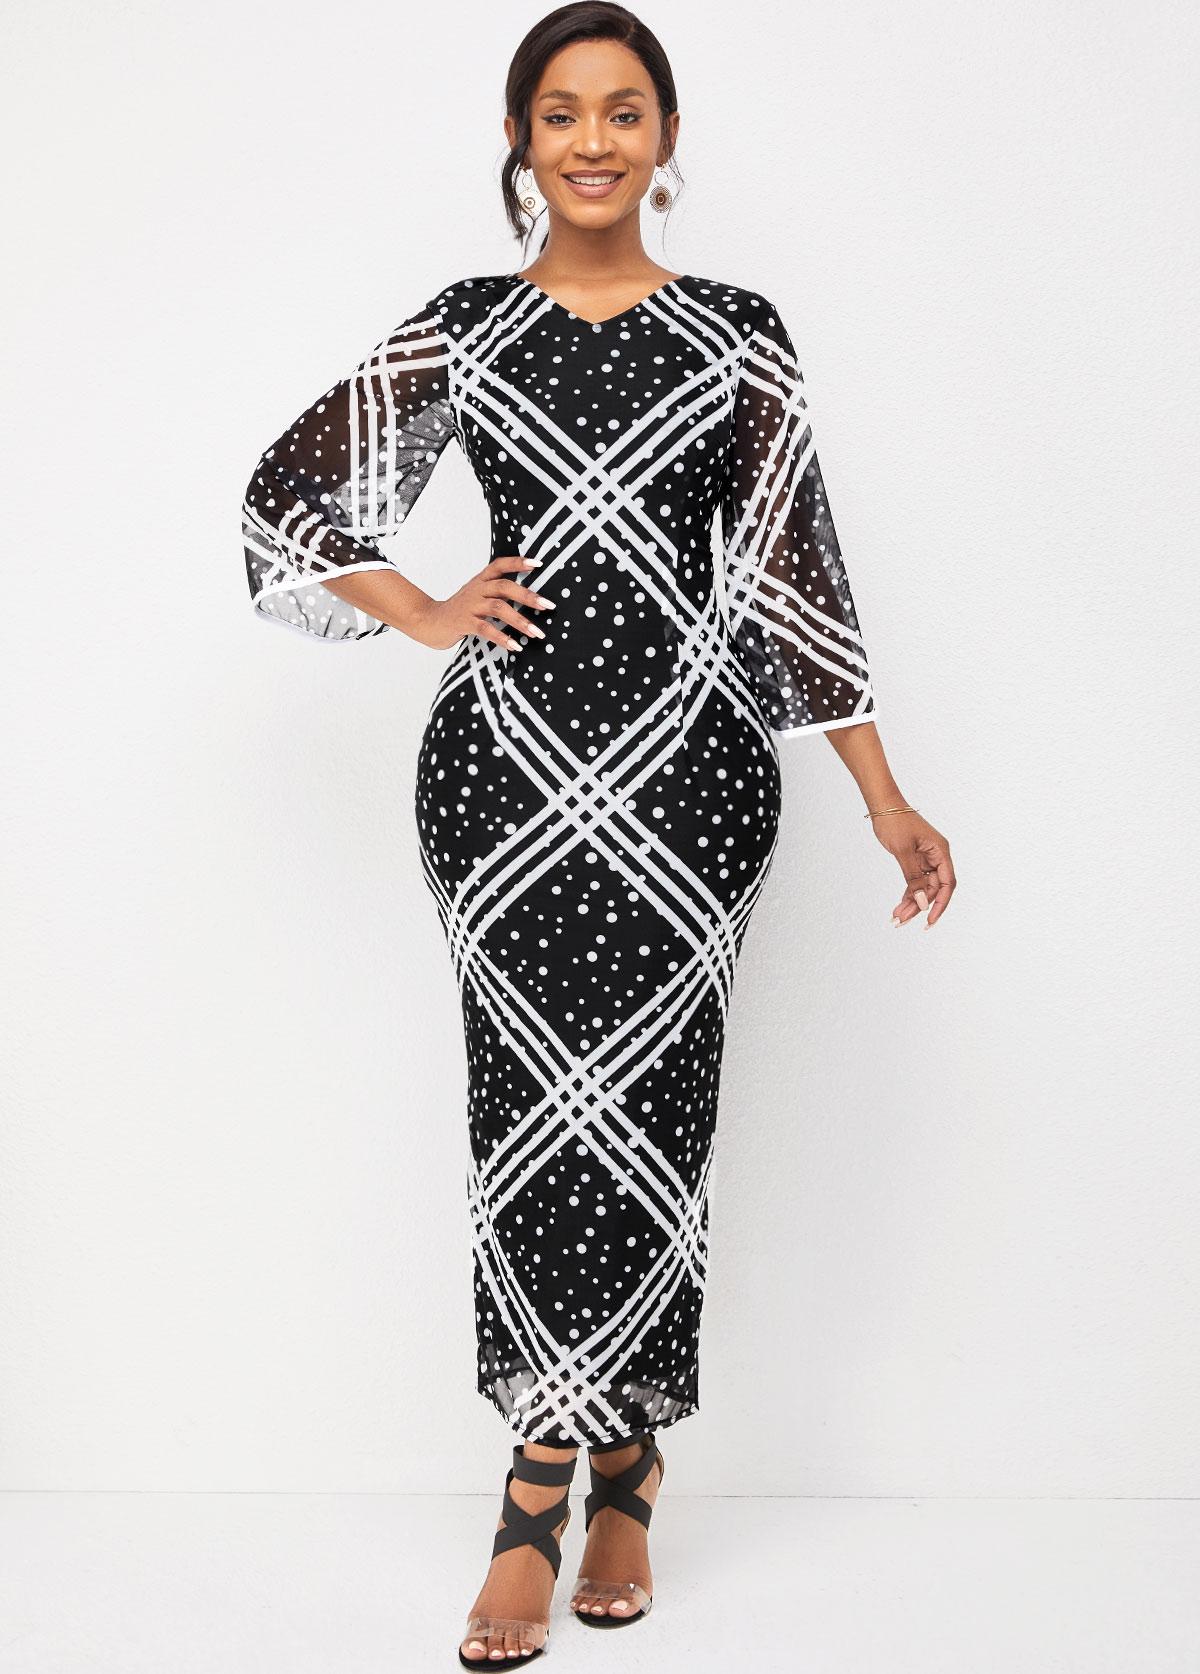 V Neck Striped and Polka Dot Flare Sleeve Dress